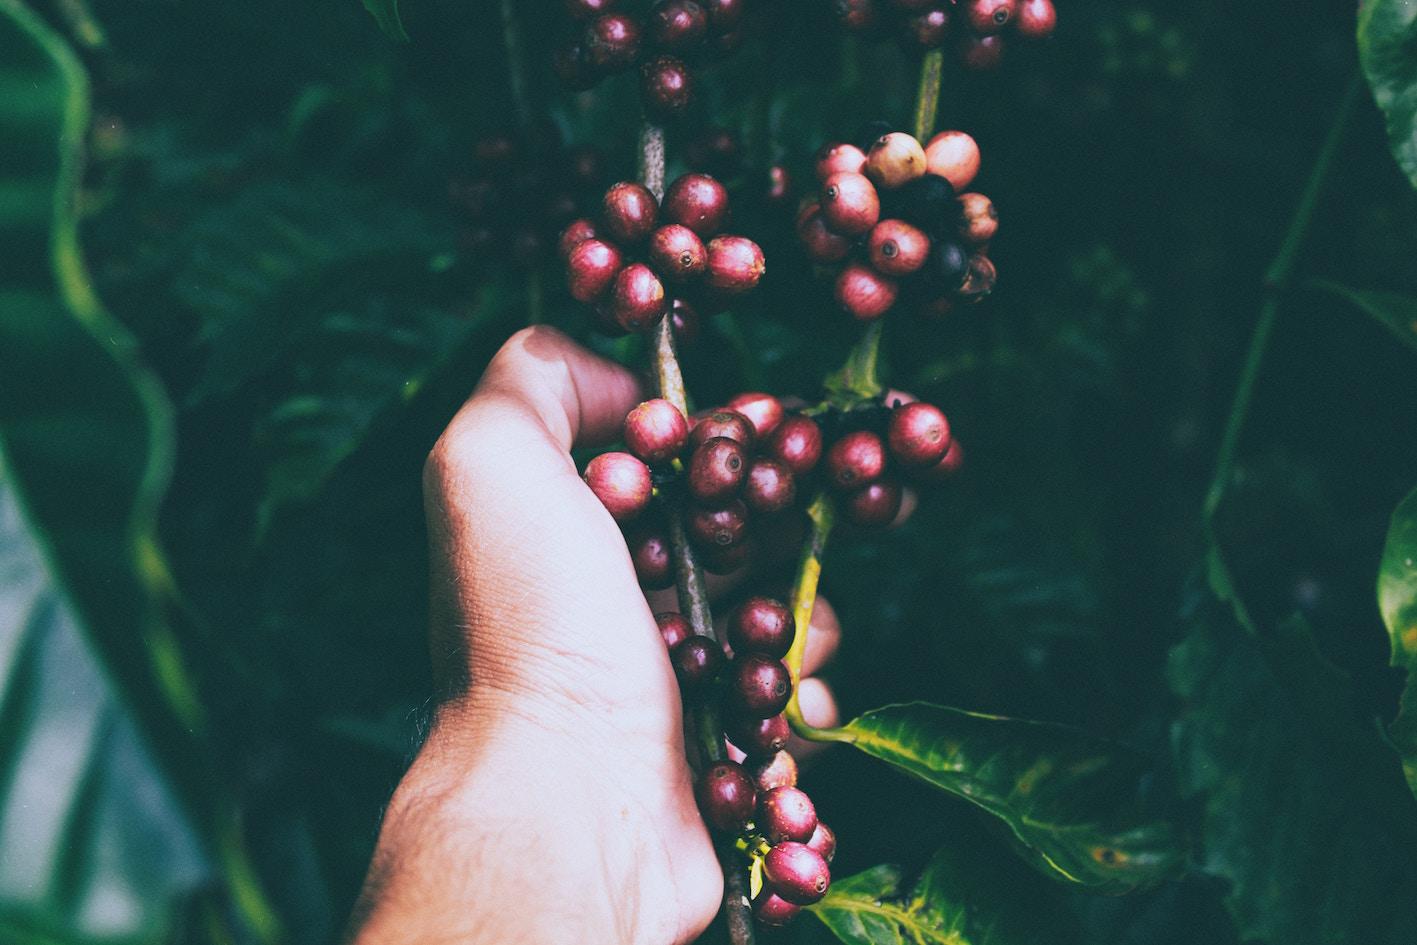 Ella-Bache-Ella-Perfect-Tomato-Exfoliating-Jelly-abloomnova.net_ Why cranberries can improve your skin